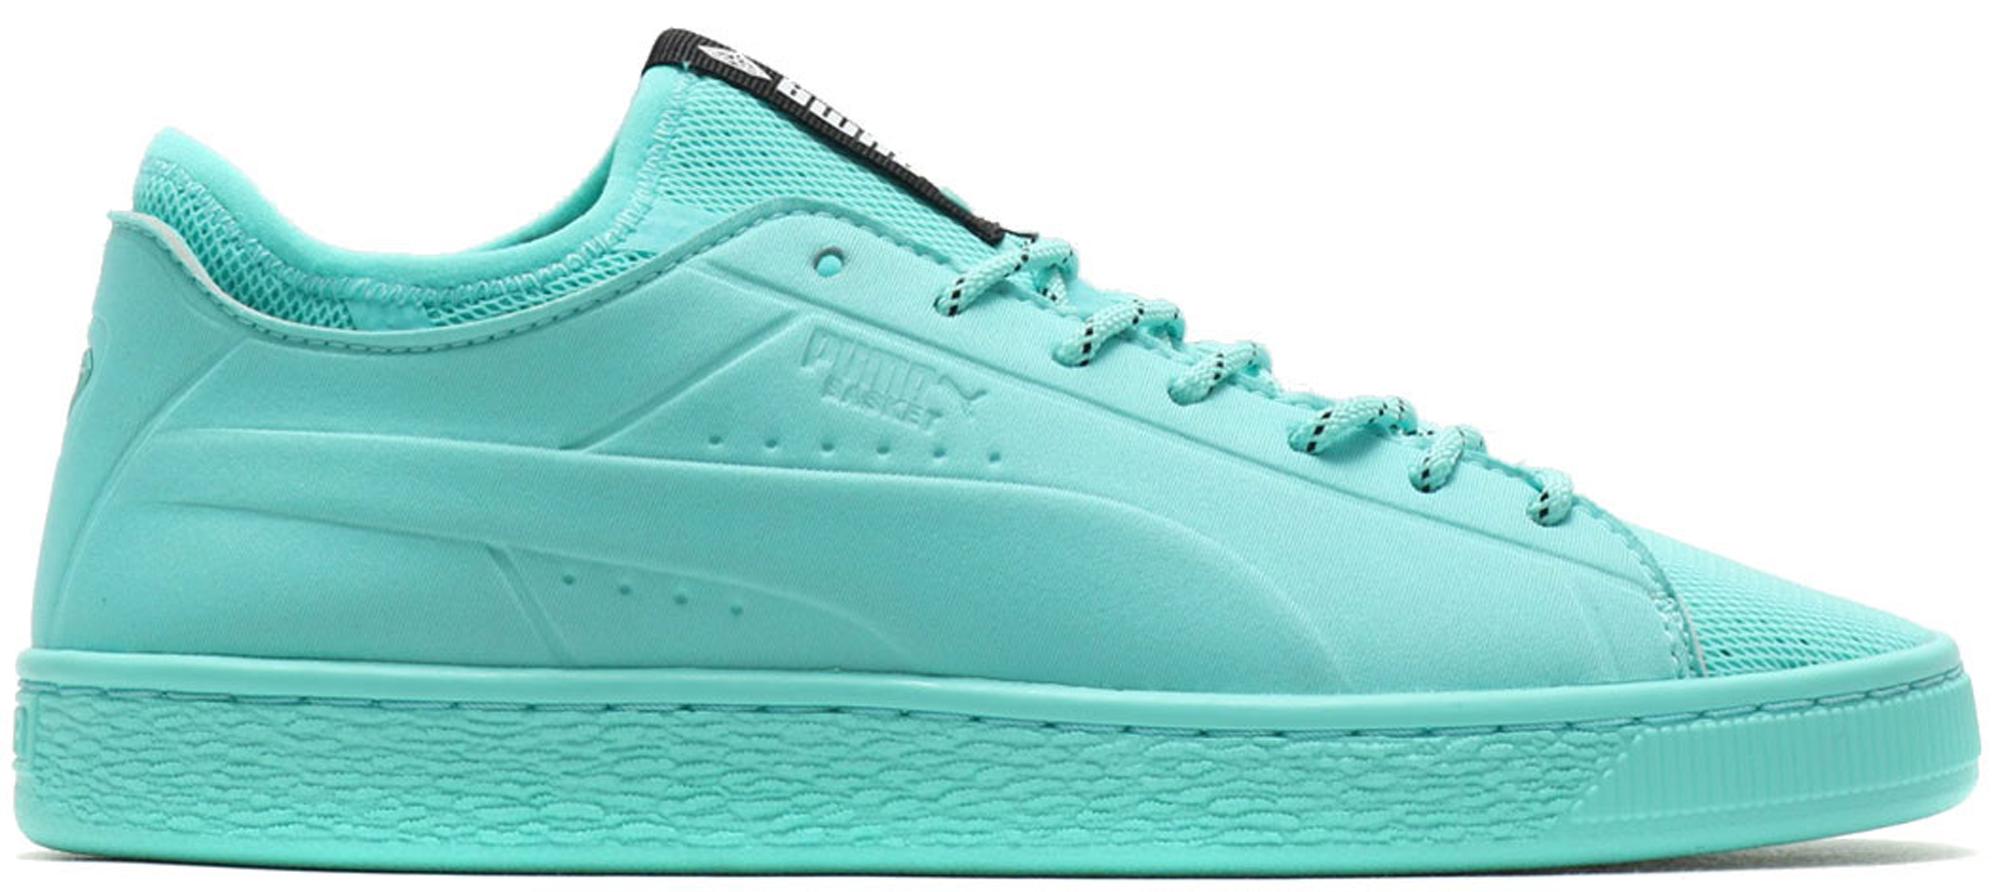 Puma Basket Sock Lo Diamond Supply Co Blue